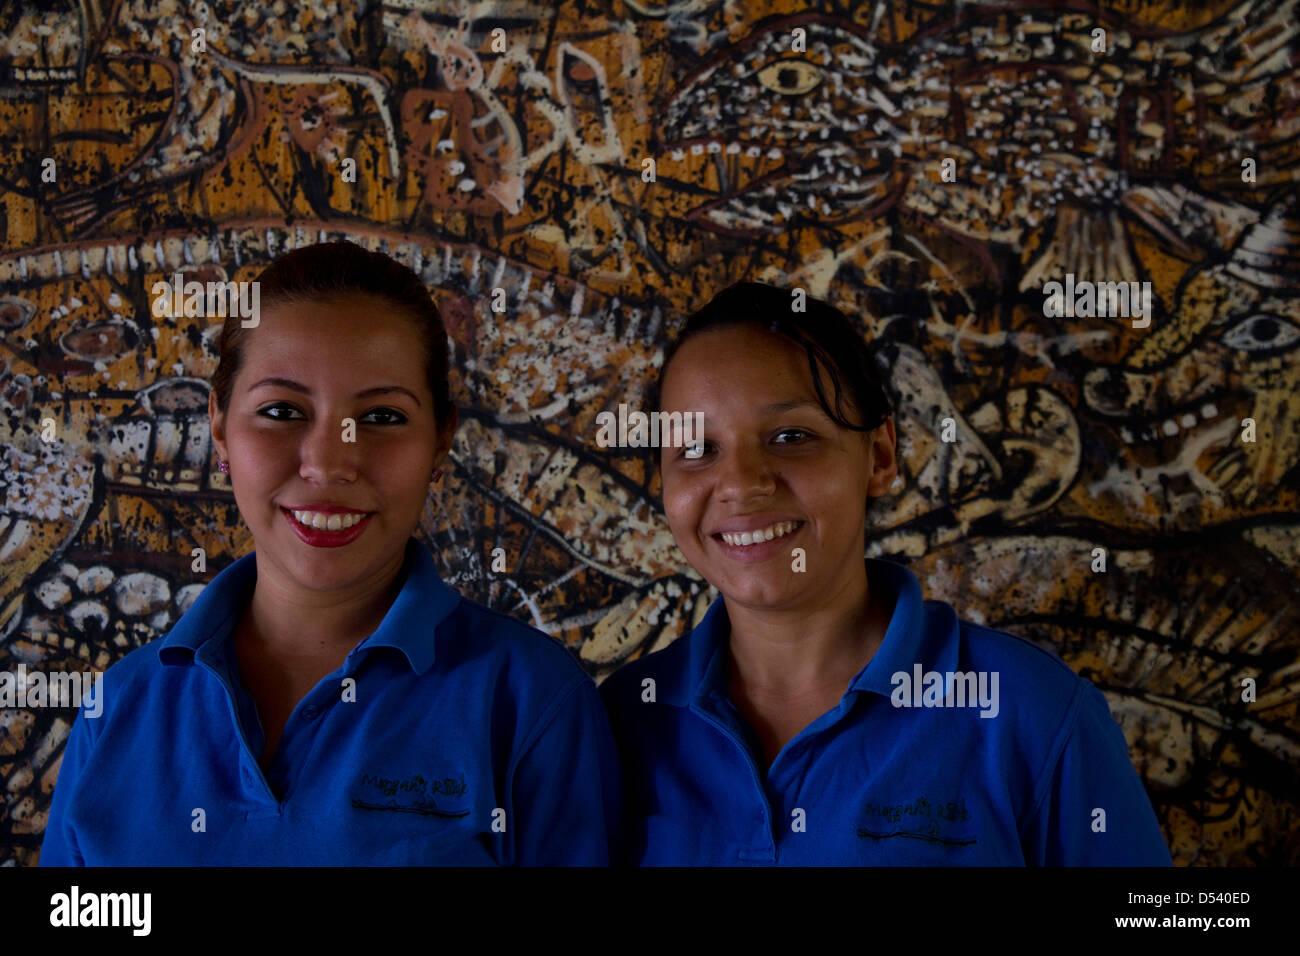 Smiling receptionists at Morgan's Rock Hacienda & Ecolodge, near San Juan del Sur, Nicaragua. - Stock Image